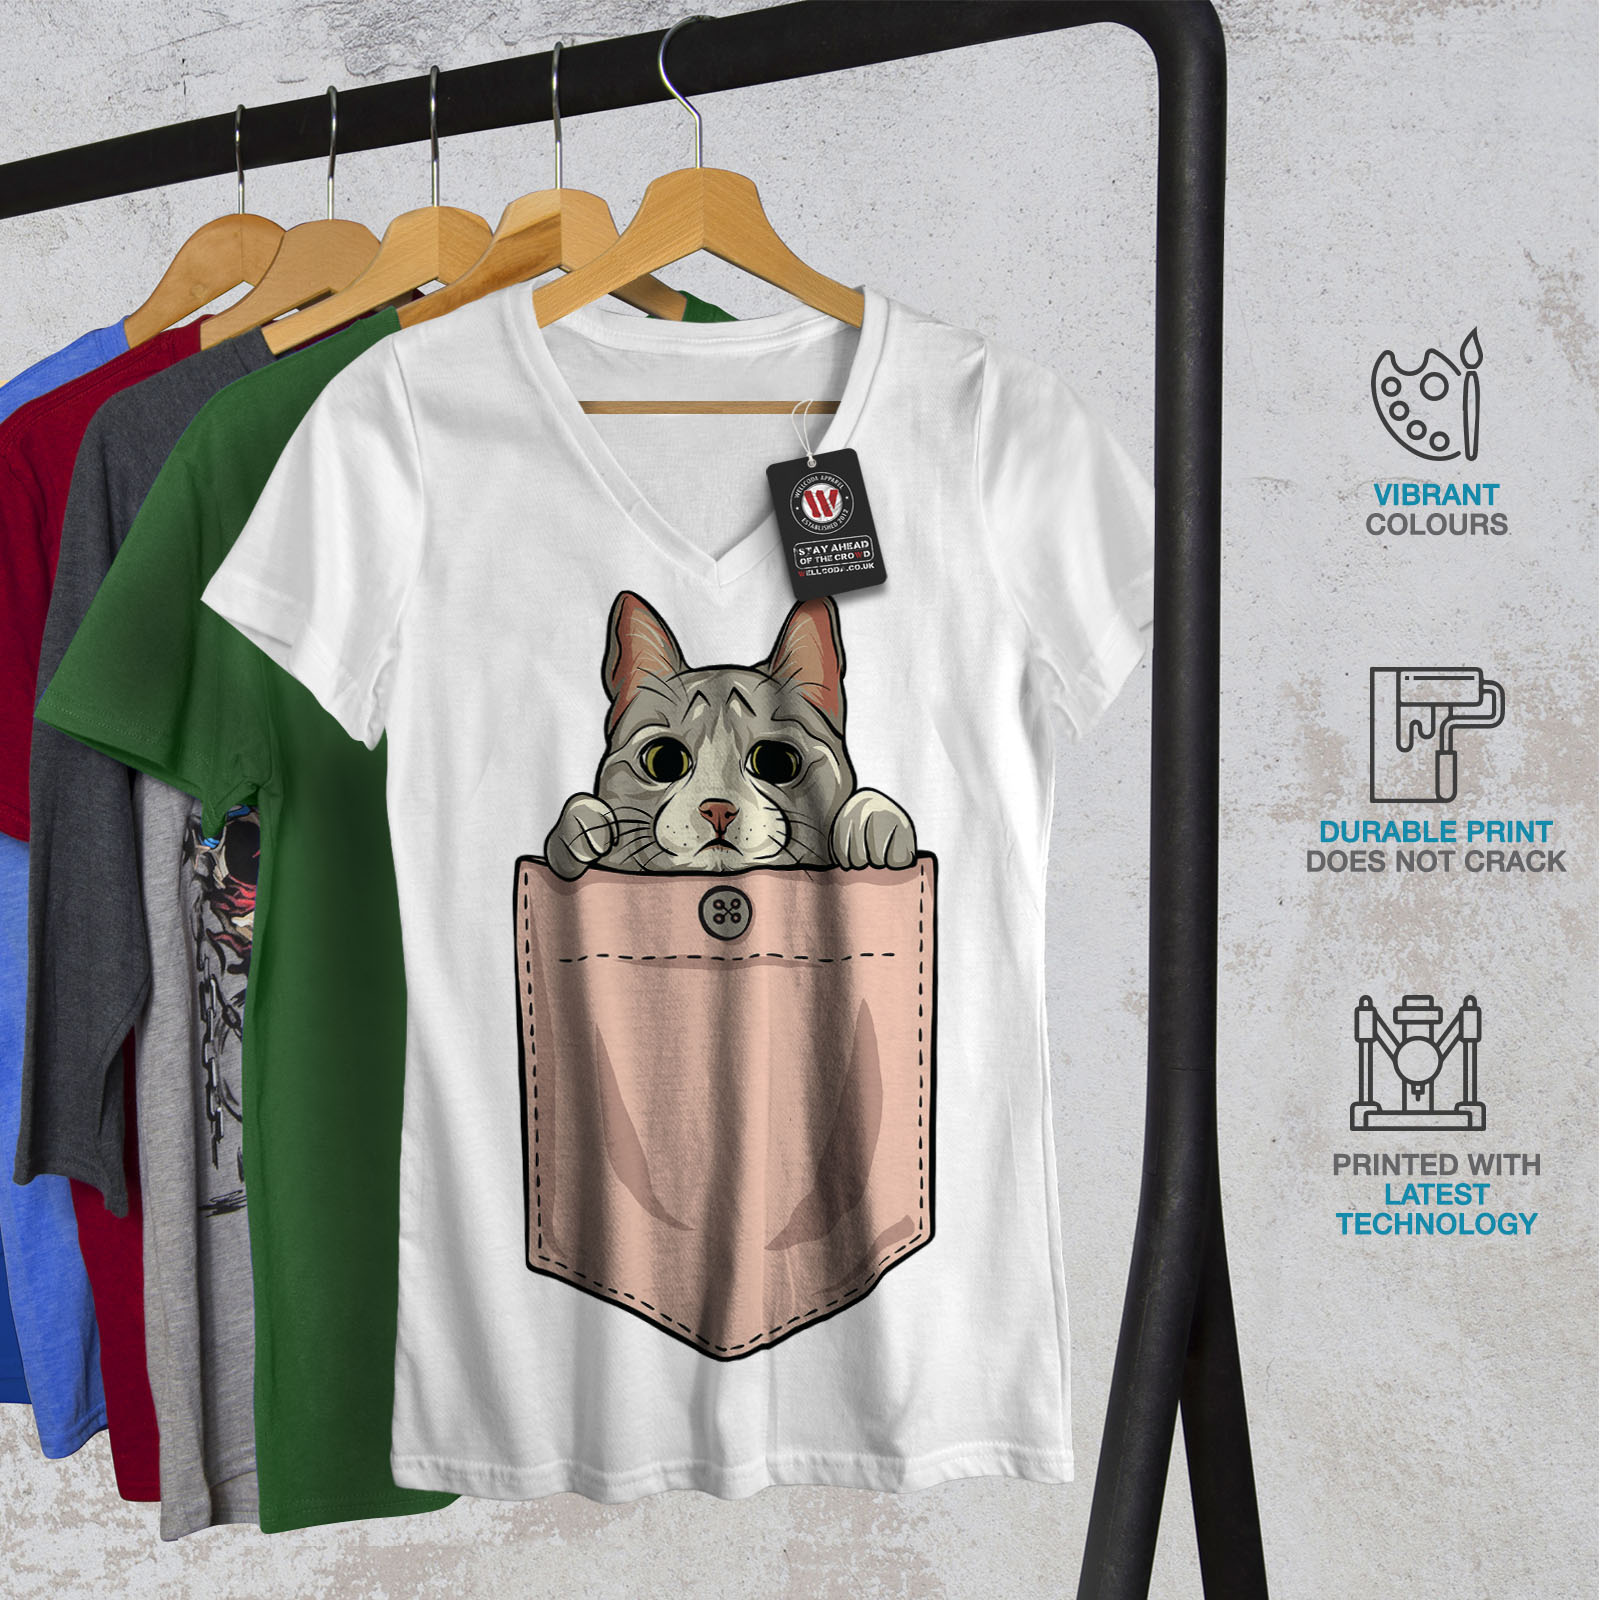 cbdc908cc849 Wellcoda Pocket Cute Kitty Cat Womens V-Neck T-shirt, 0 Graphic ...